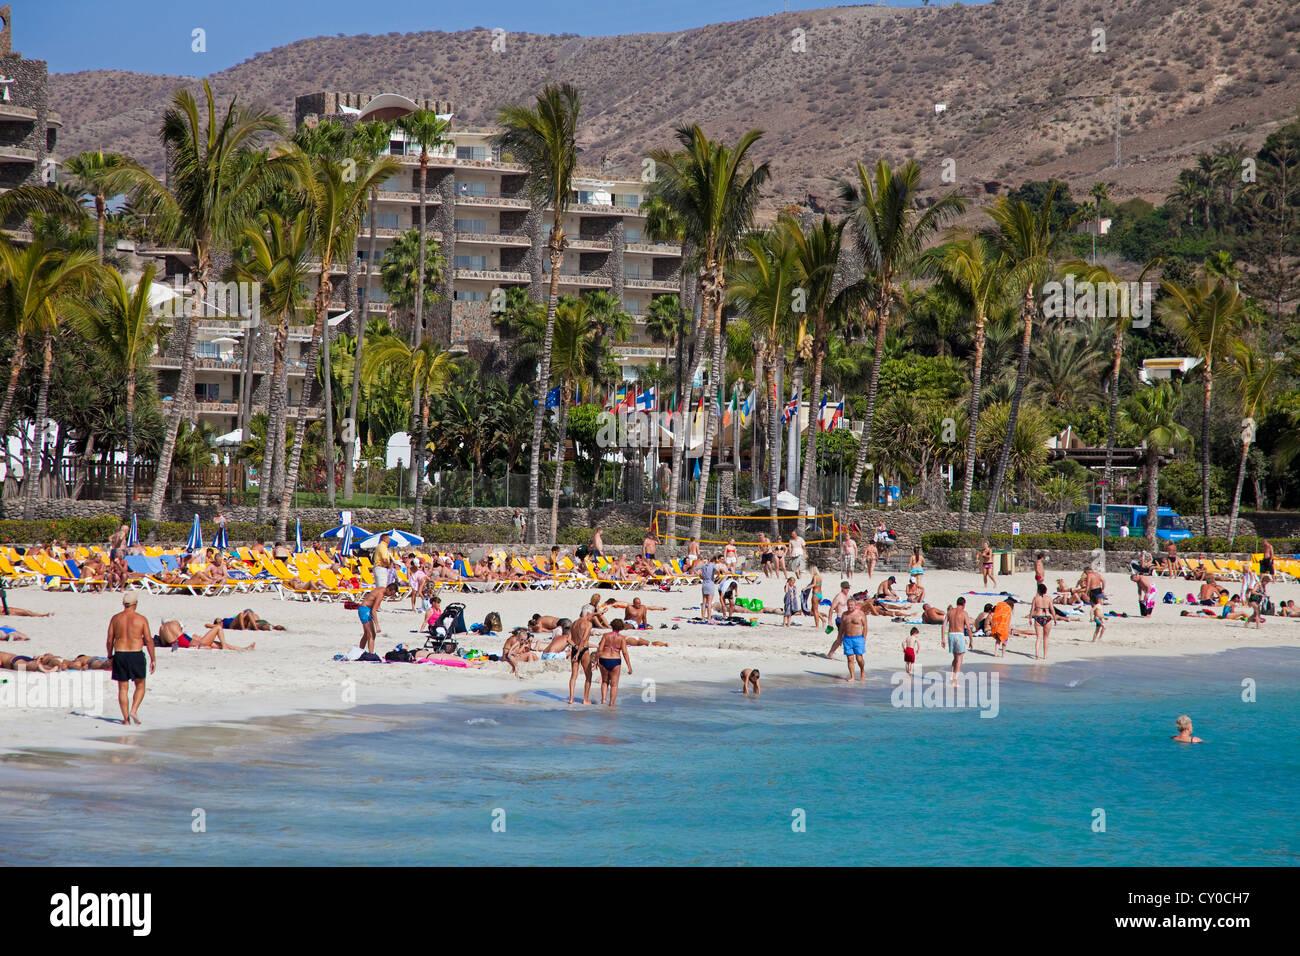 Beach and hotel complex of Anfi del Mar, Playa de la Verga, near Arguineguin, Gran Canaria, Canary Islands, Spain, Stock Photo